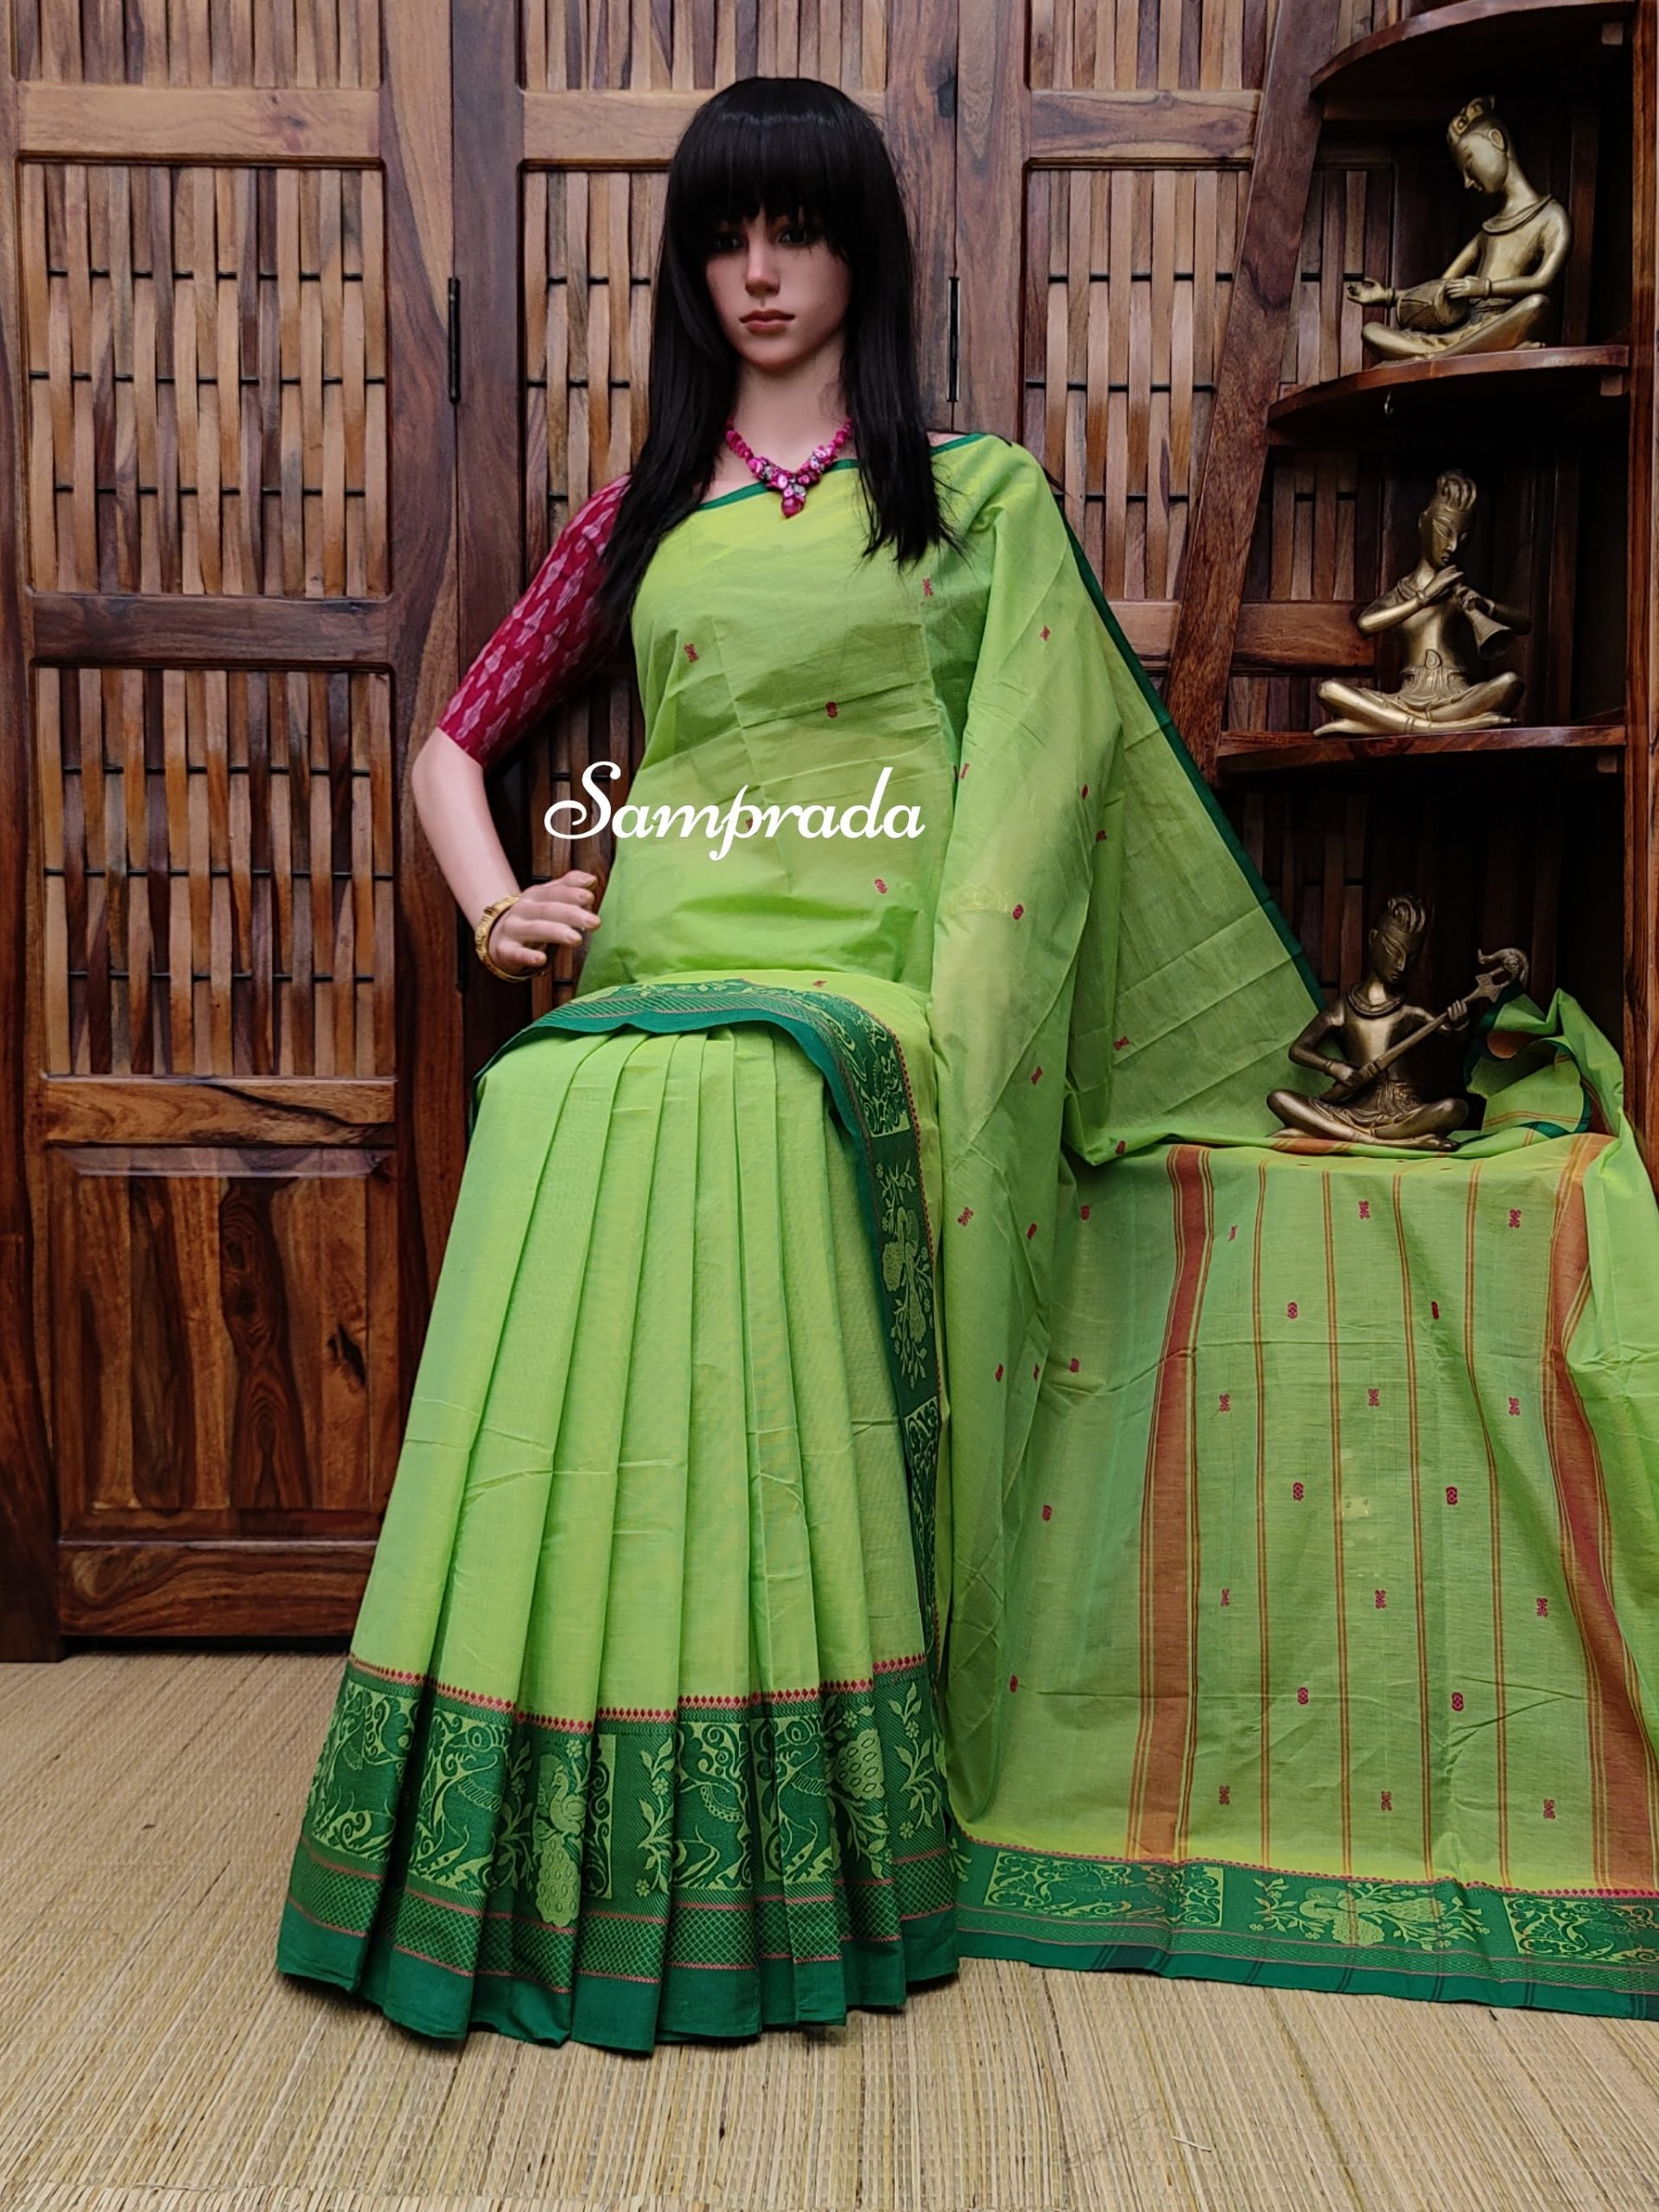 Samuditha - South Cotton Saree